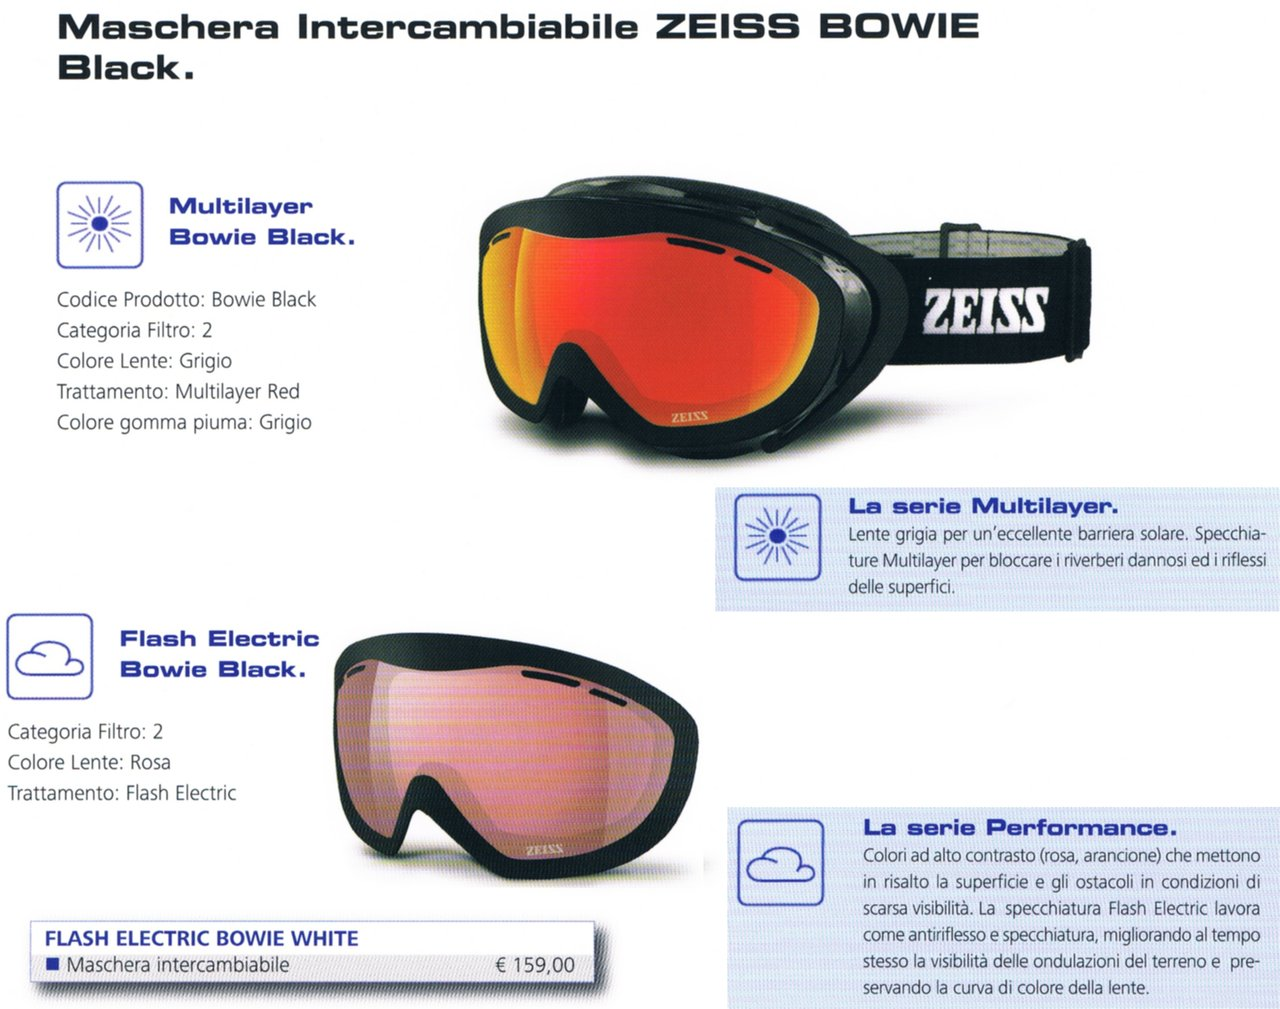 df7eb51b7d Ski Mask ZEISS BOWIE BLACK DUOBLE LENS Ski Goggles